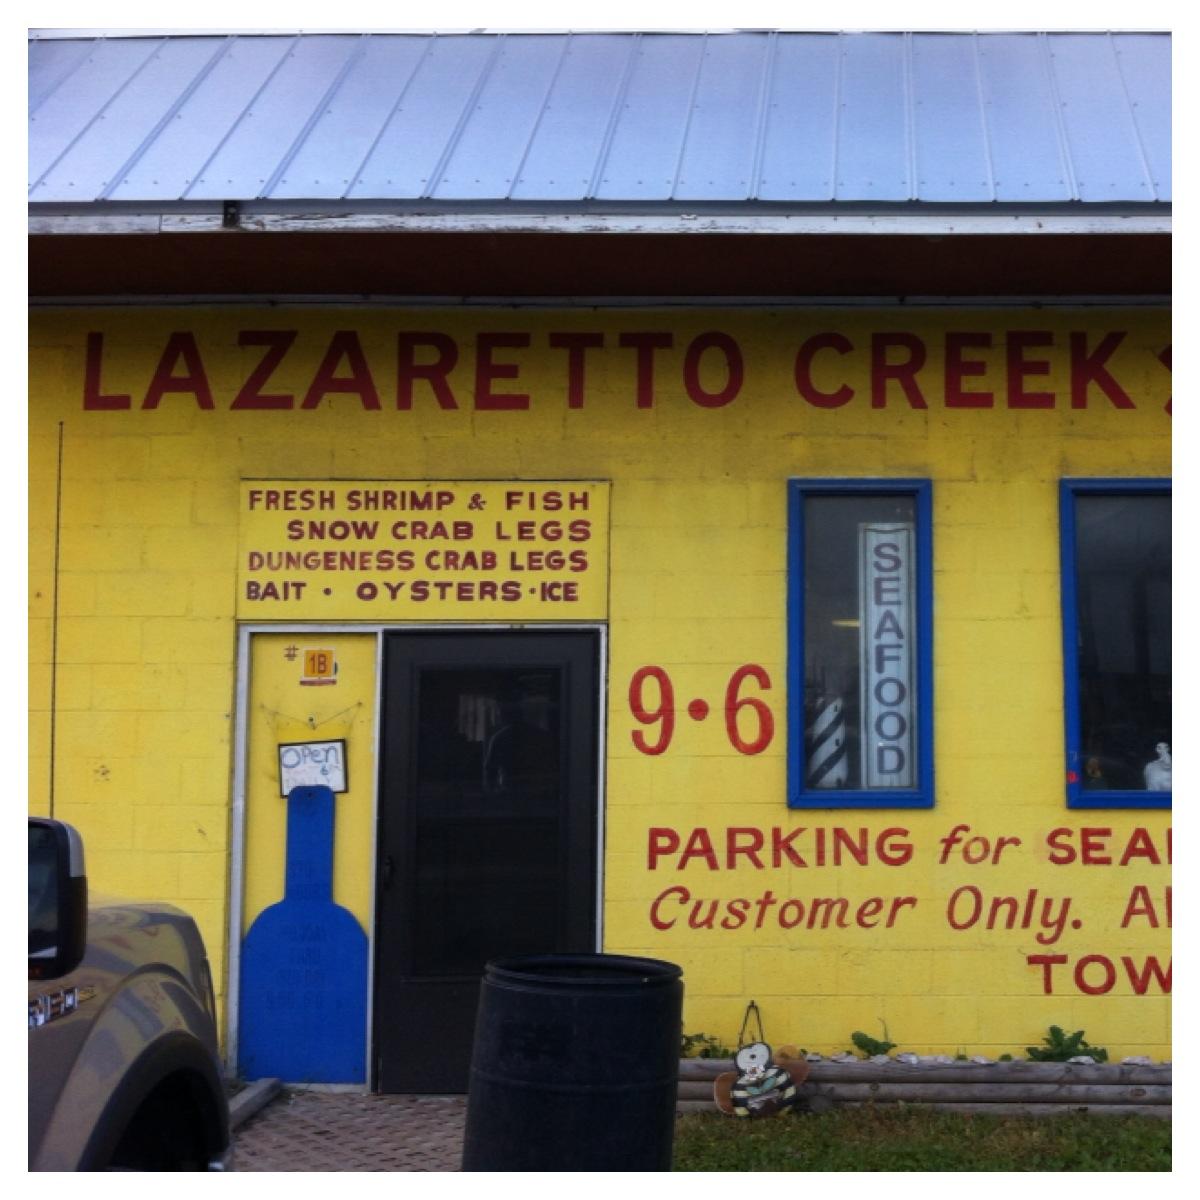 Tybee joy vacationslazaretto creek archives tybee joy for Captain mike s fresh fish seafood